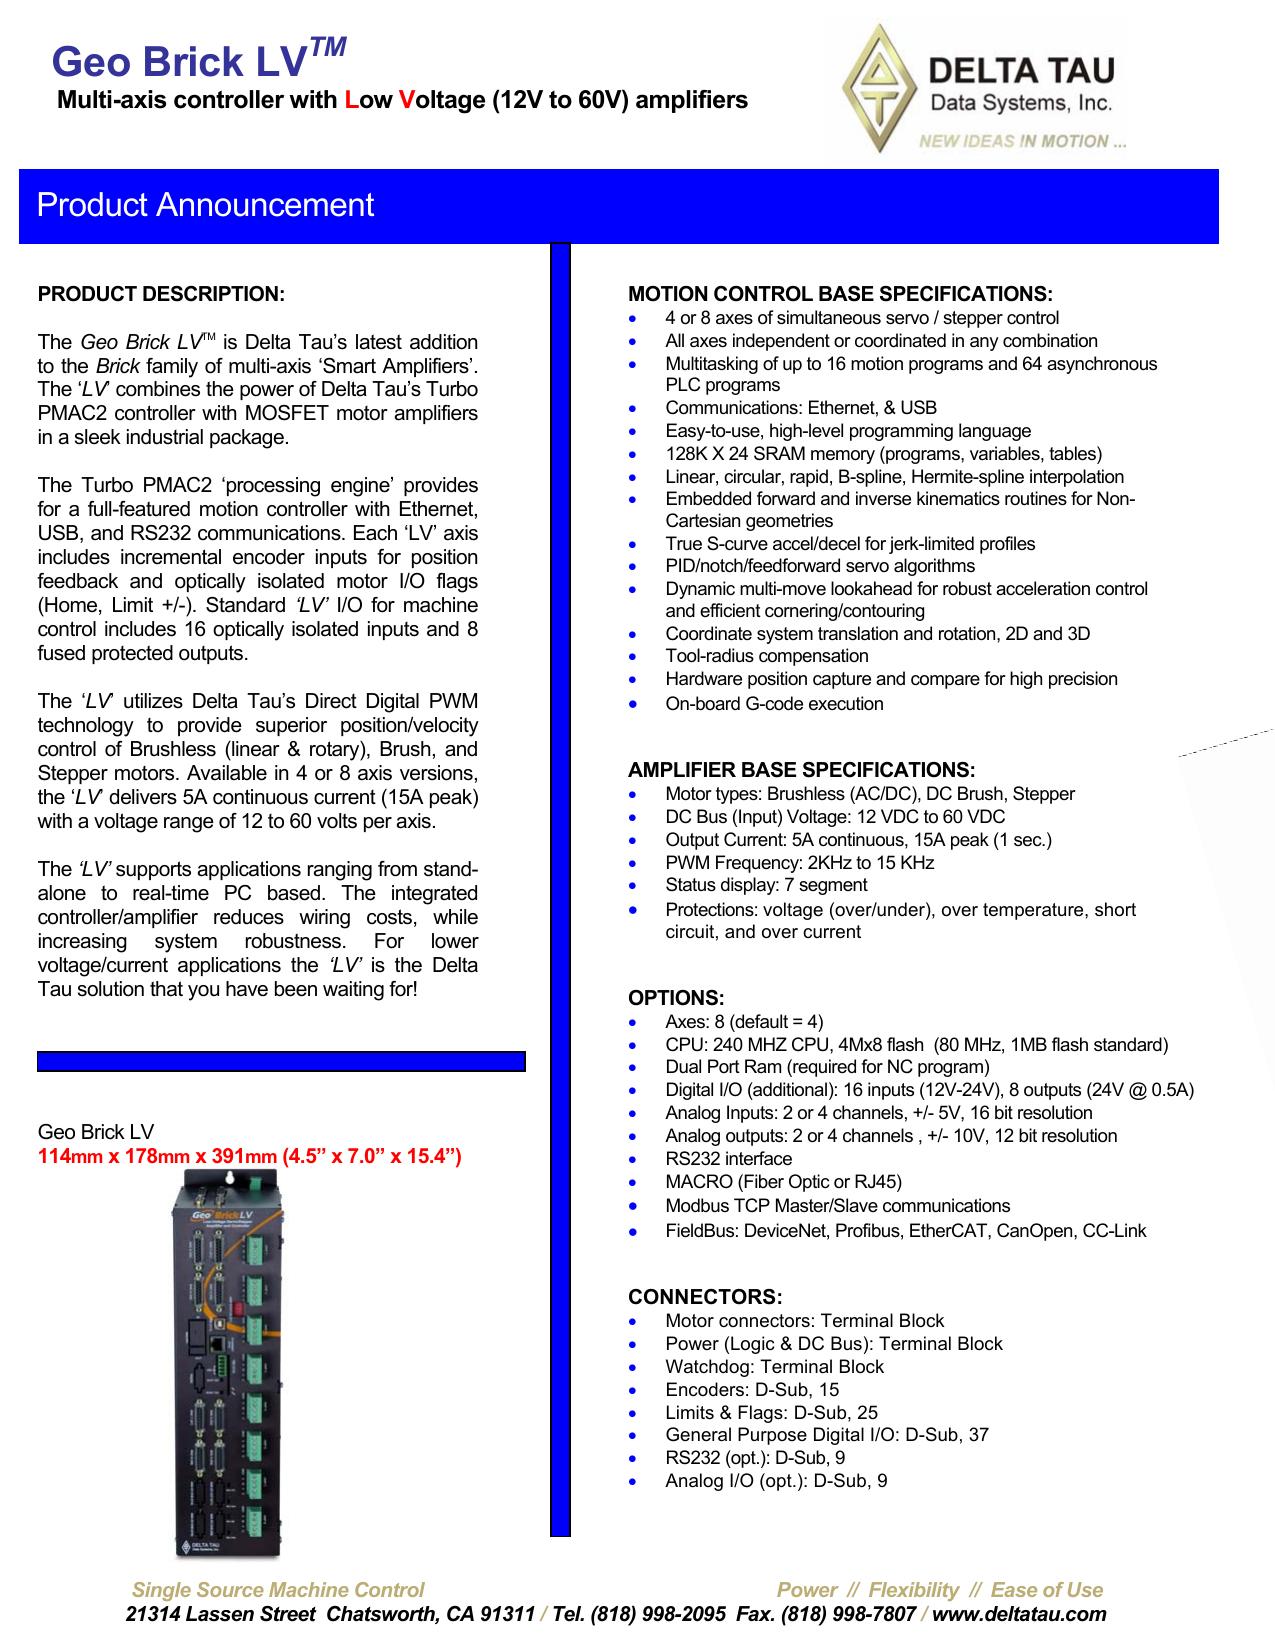 Geo Brick Lv 240w Mosfet Amplifier